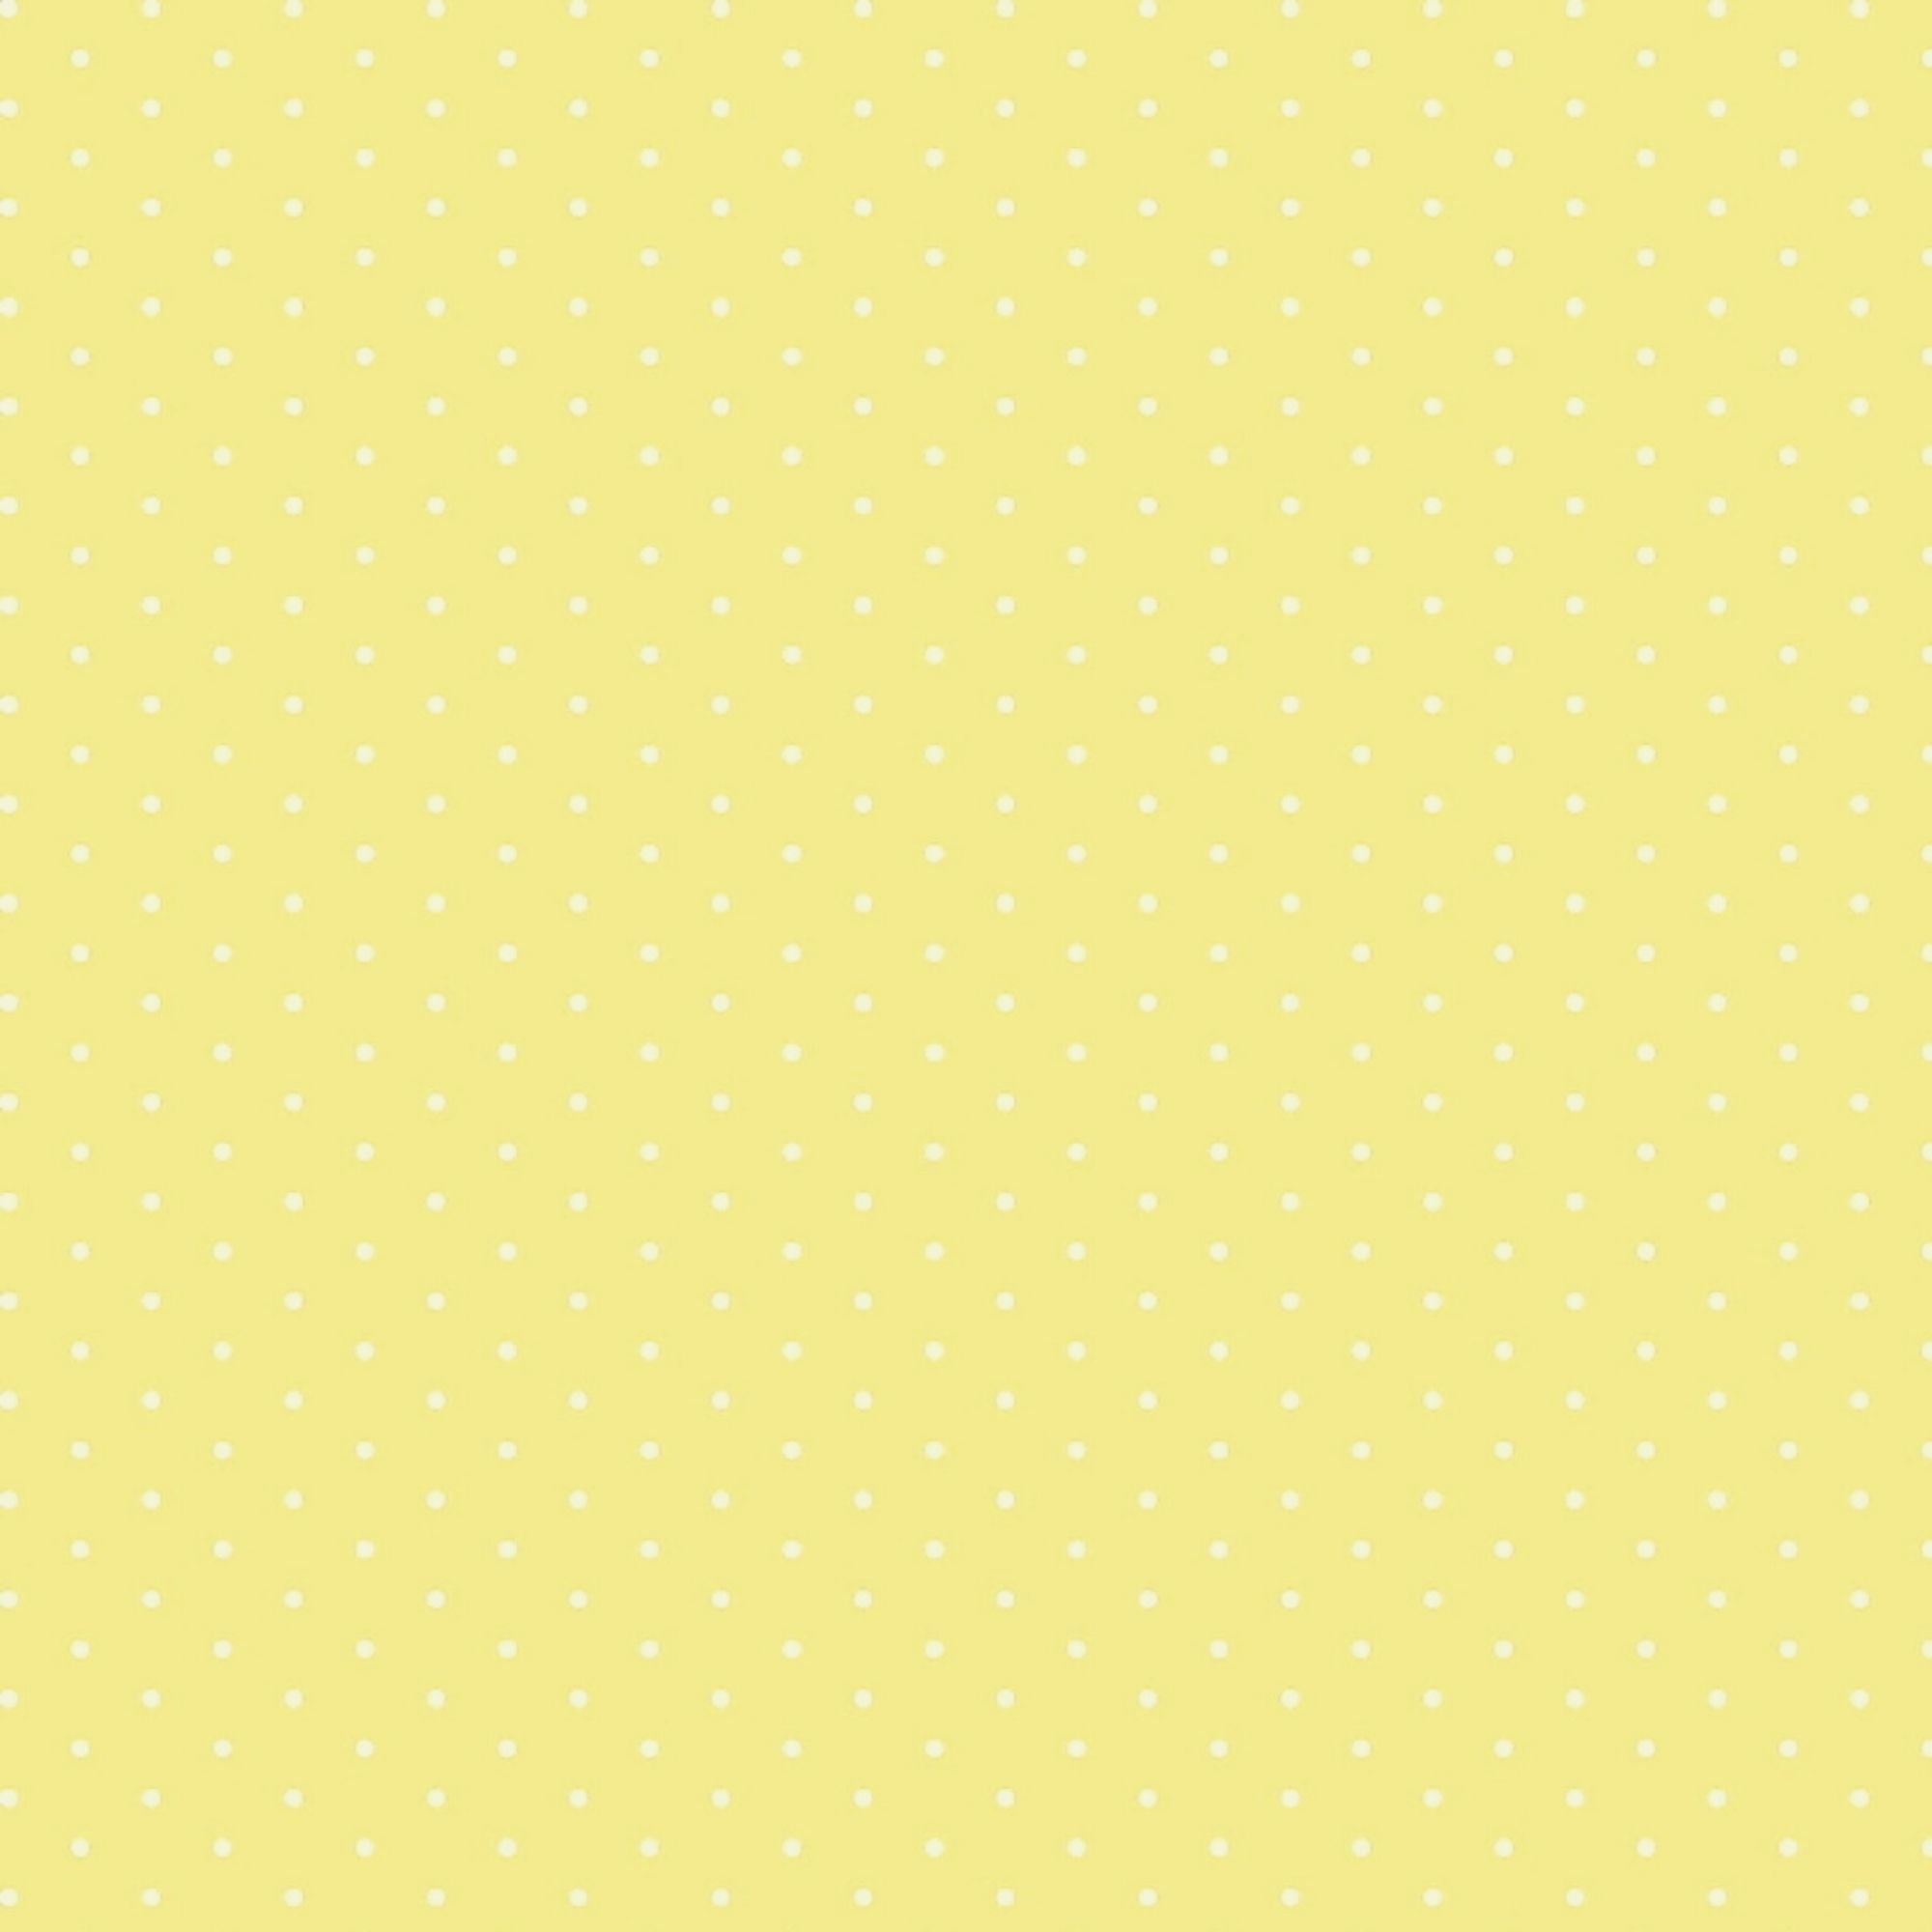 Tecido Tricoline Micro Poá Branco - Fundo Amarelo Claro - Preço de 50 cm X 150 cm